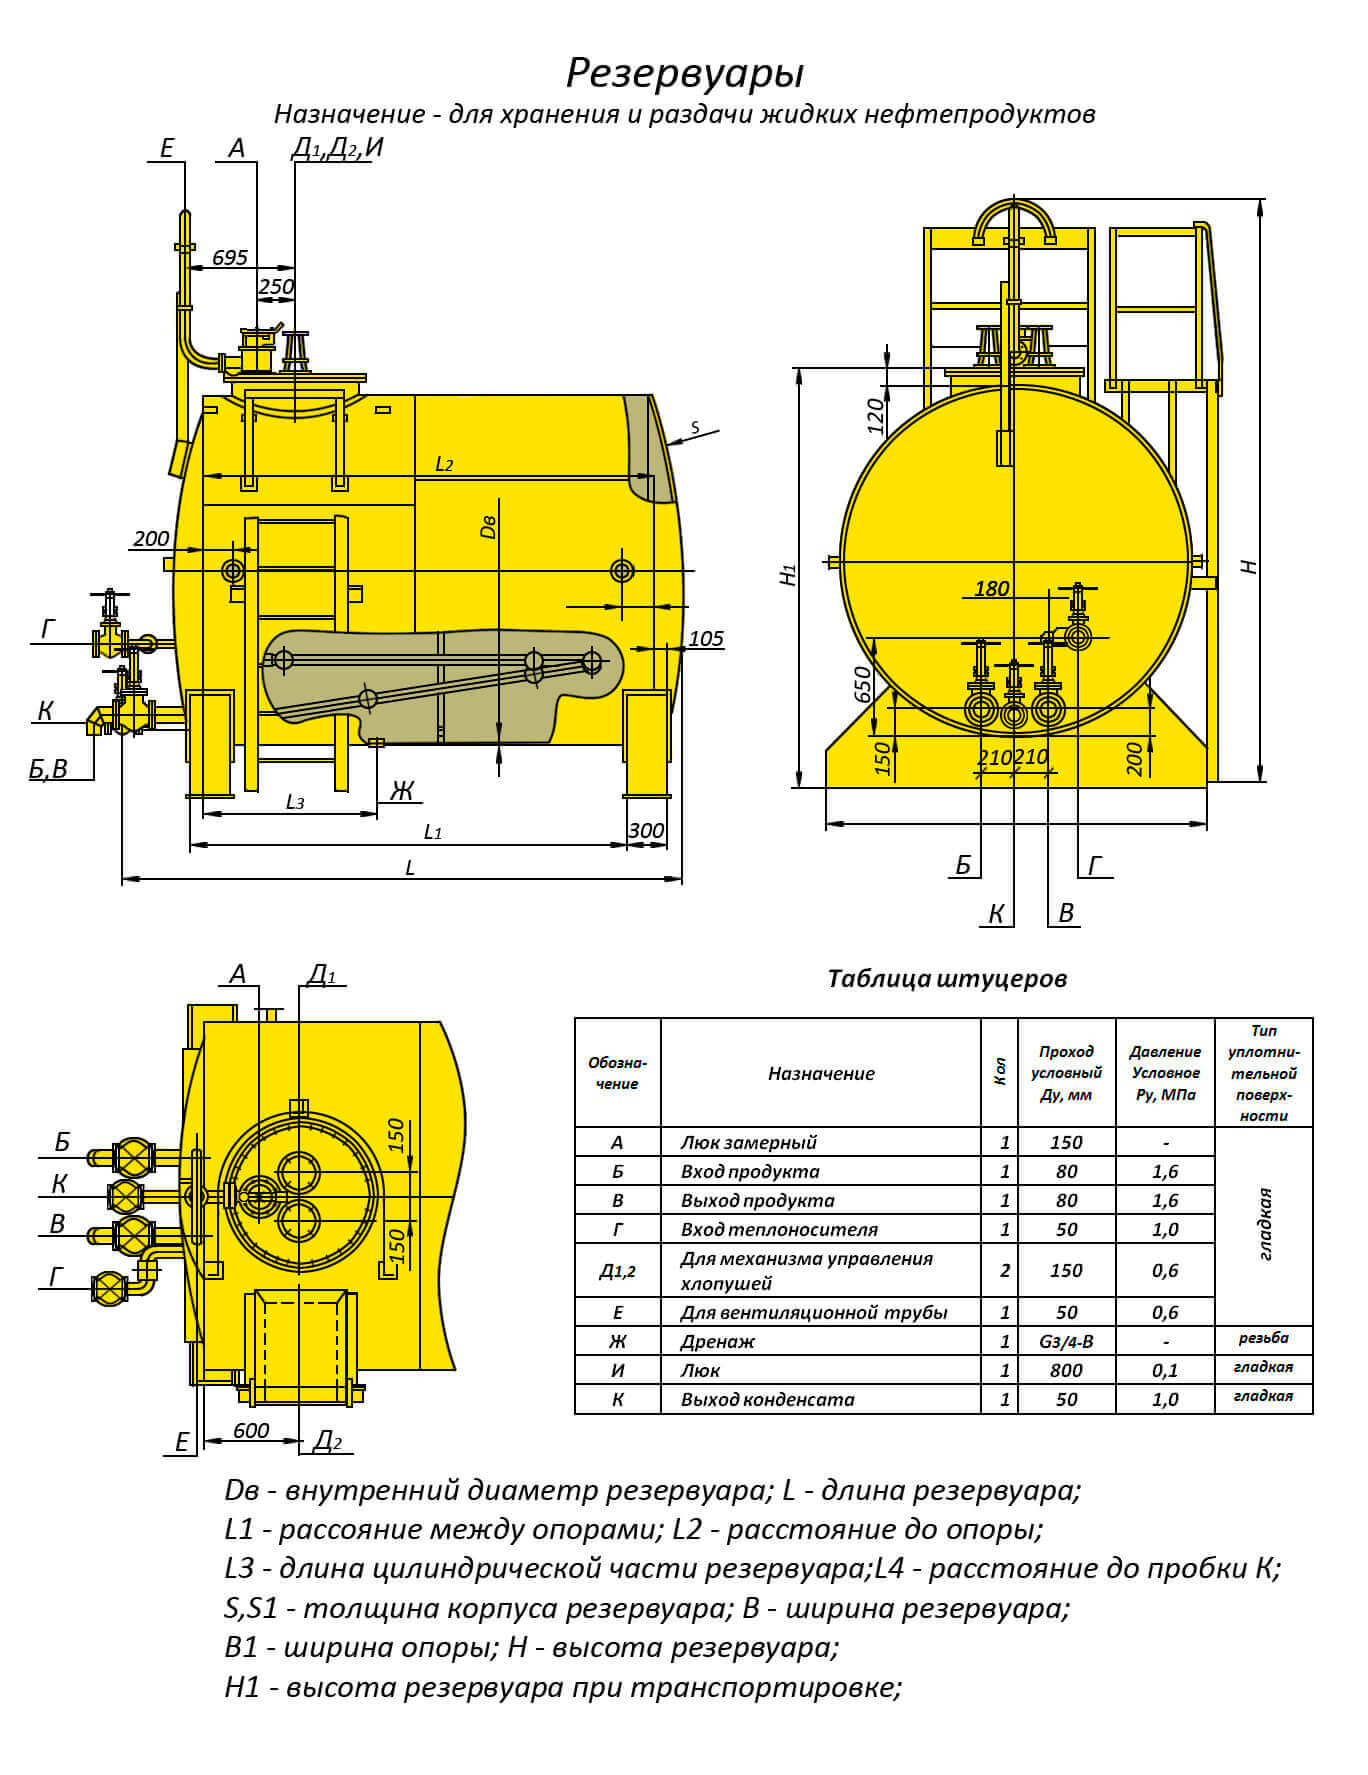 rezervuary i emkosti cilindricheskie rvs rgs 5 Резервуары и емкости цилиндрические (РВС , РГС)